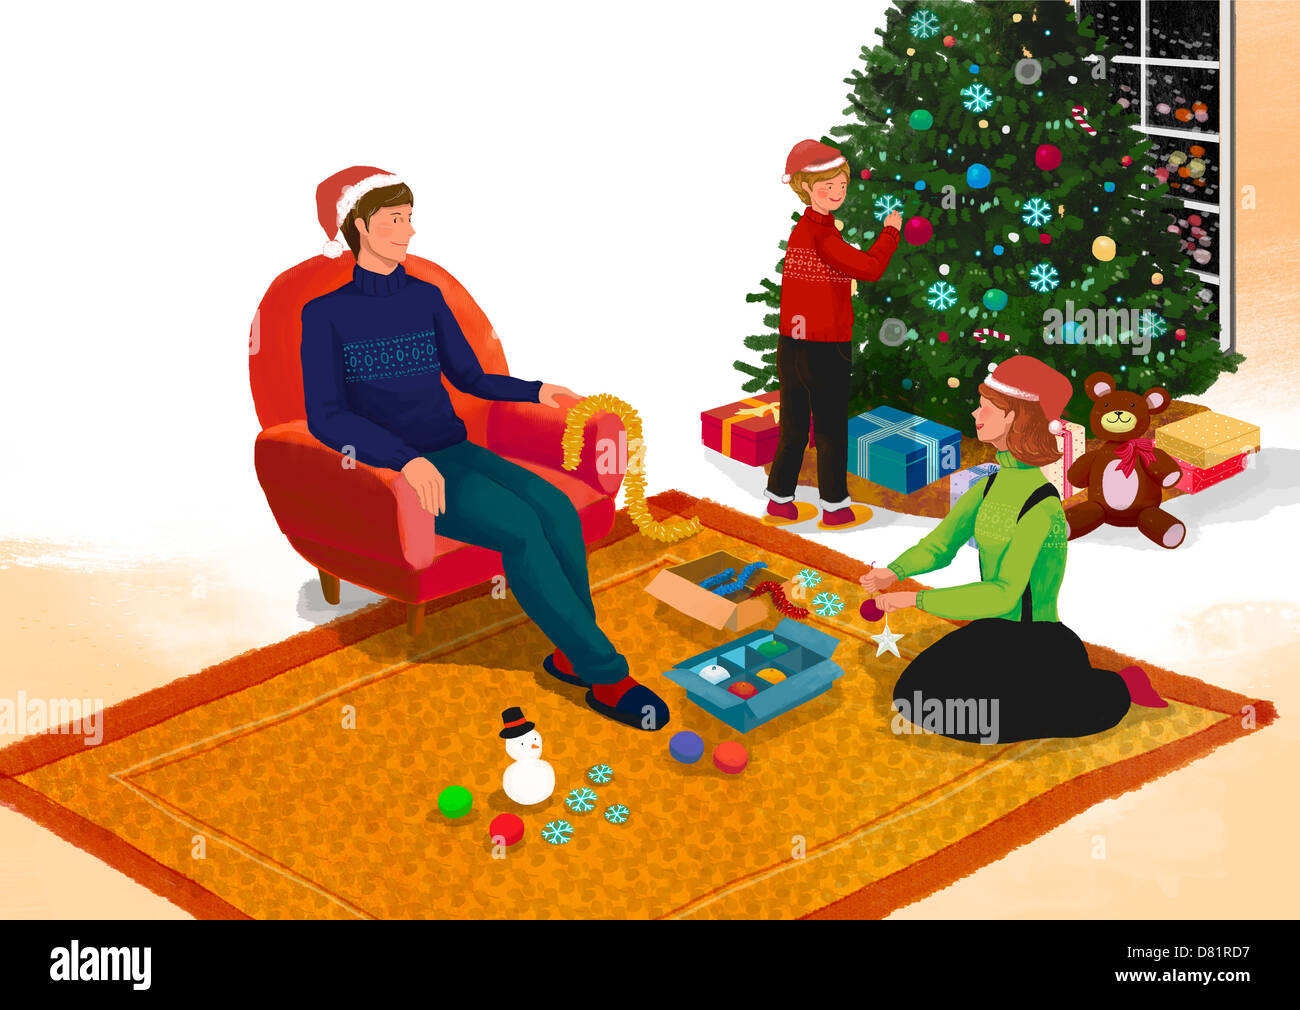 christmas illustration family stockfotos christmas illustration family bilder alamy. Black Bedroom Furniture Sets. Home Design Ideas